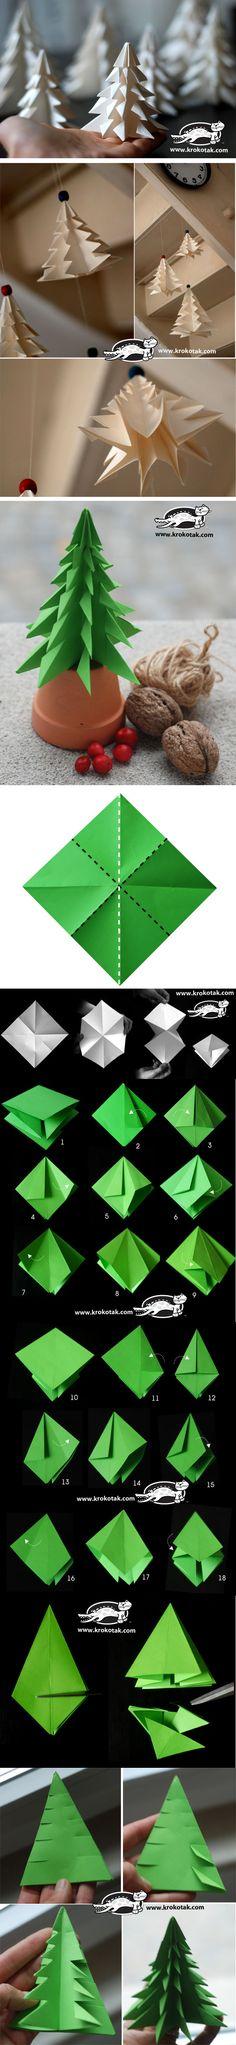 Sapin en origami  fait  maison...Beau  !!!